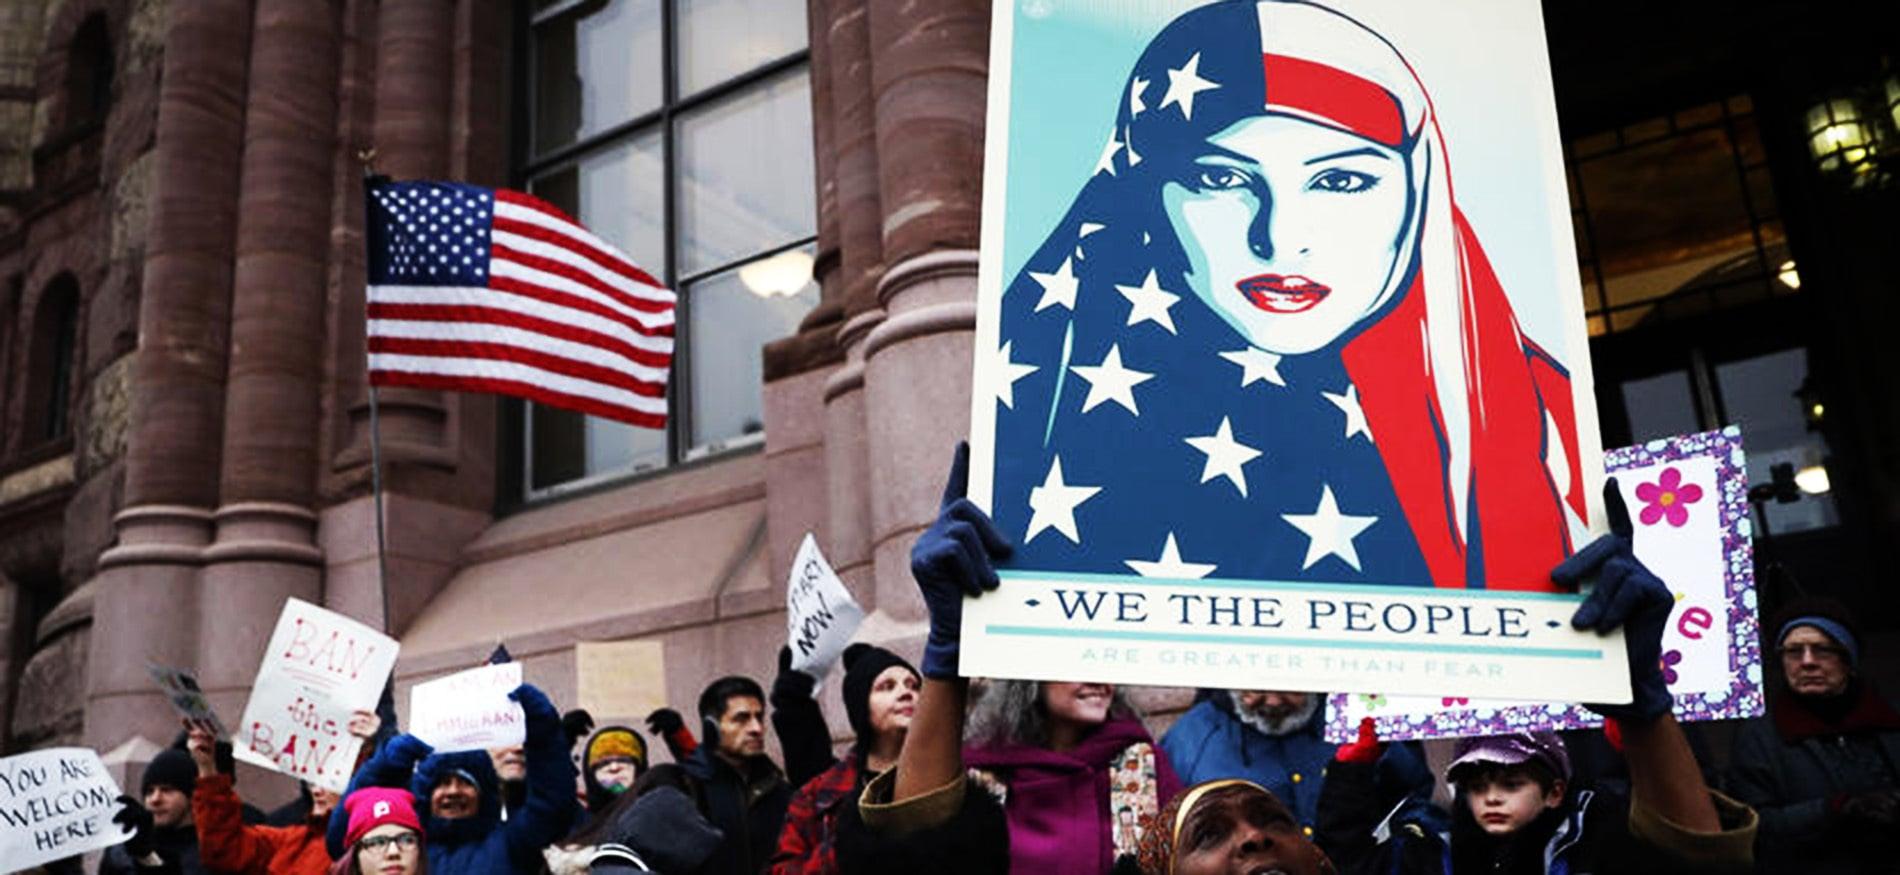 Islamophobia in America is worse on 9/11/2016 than it was on 9/11/2001